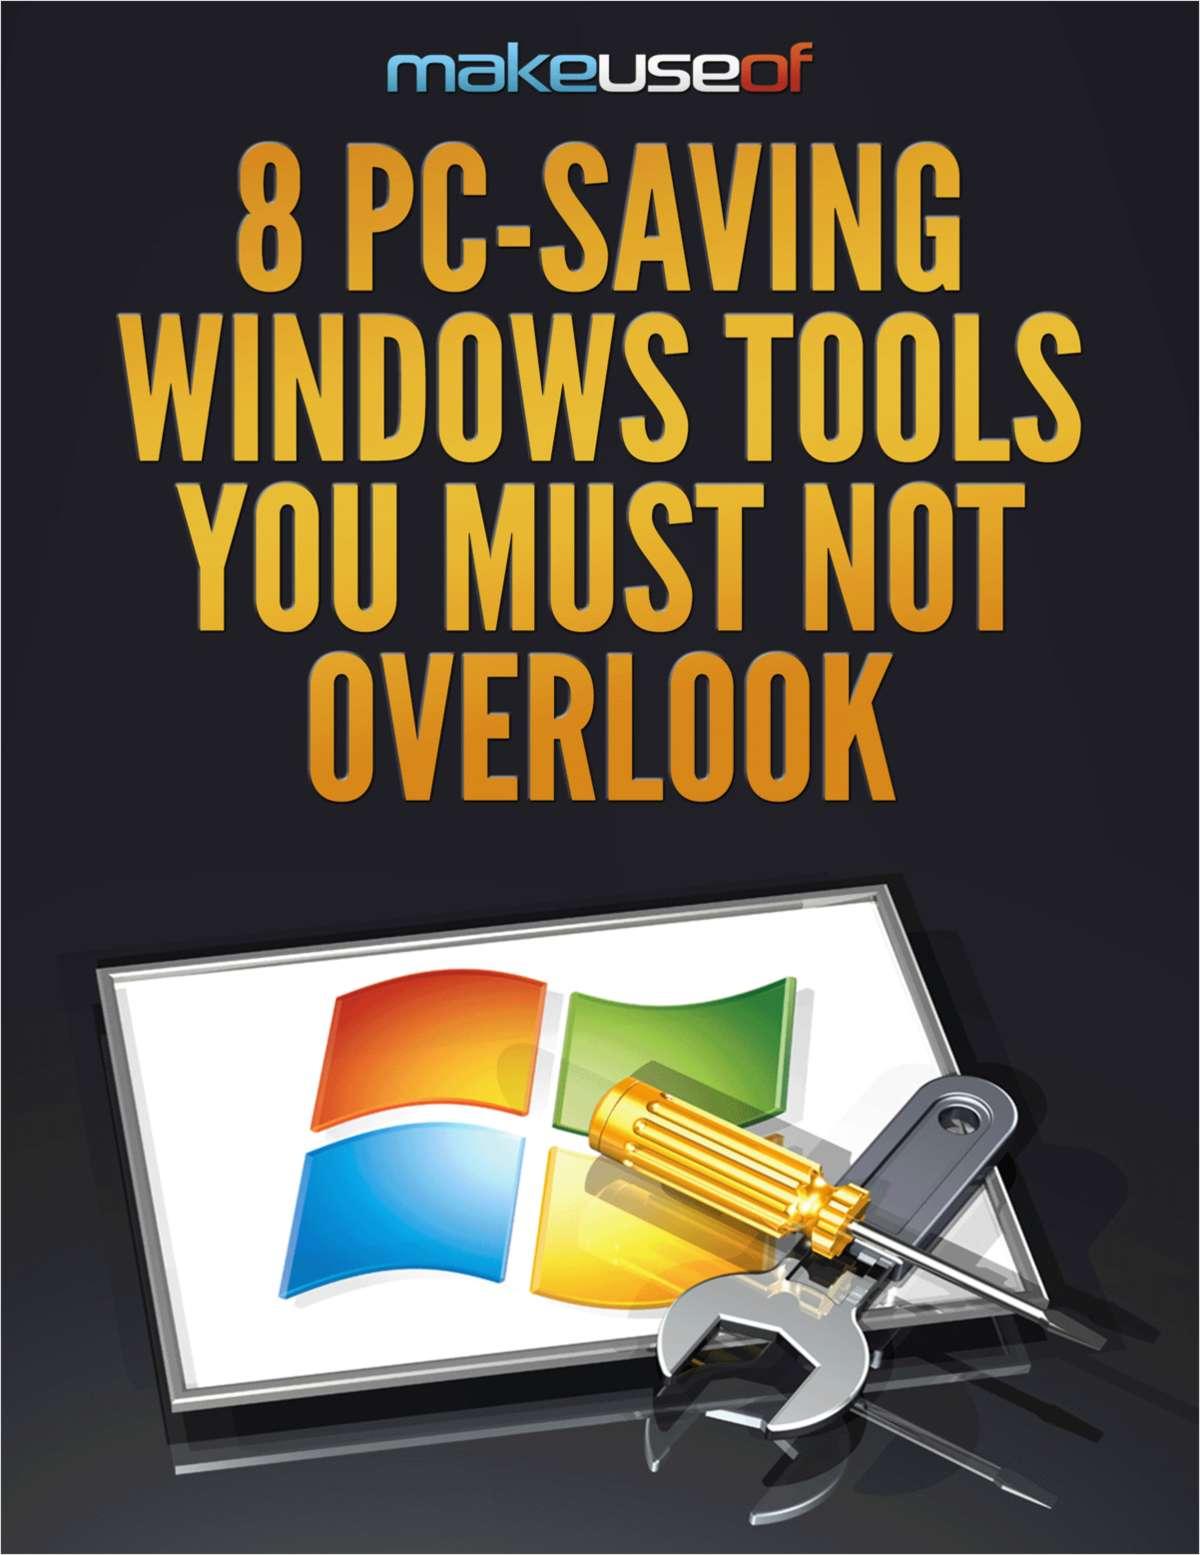 8 PC-Saving Windows Tools You Must Not Overlook